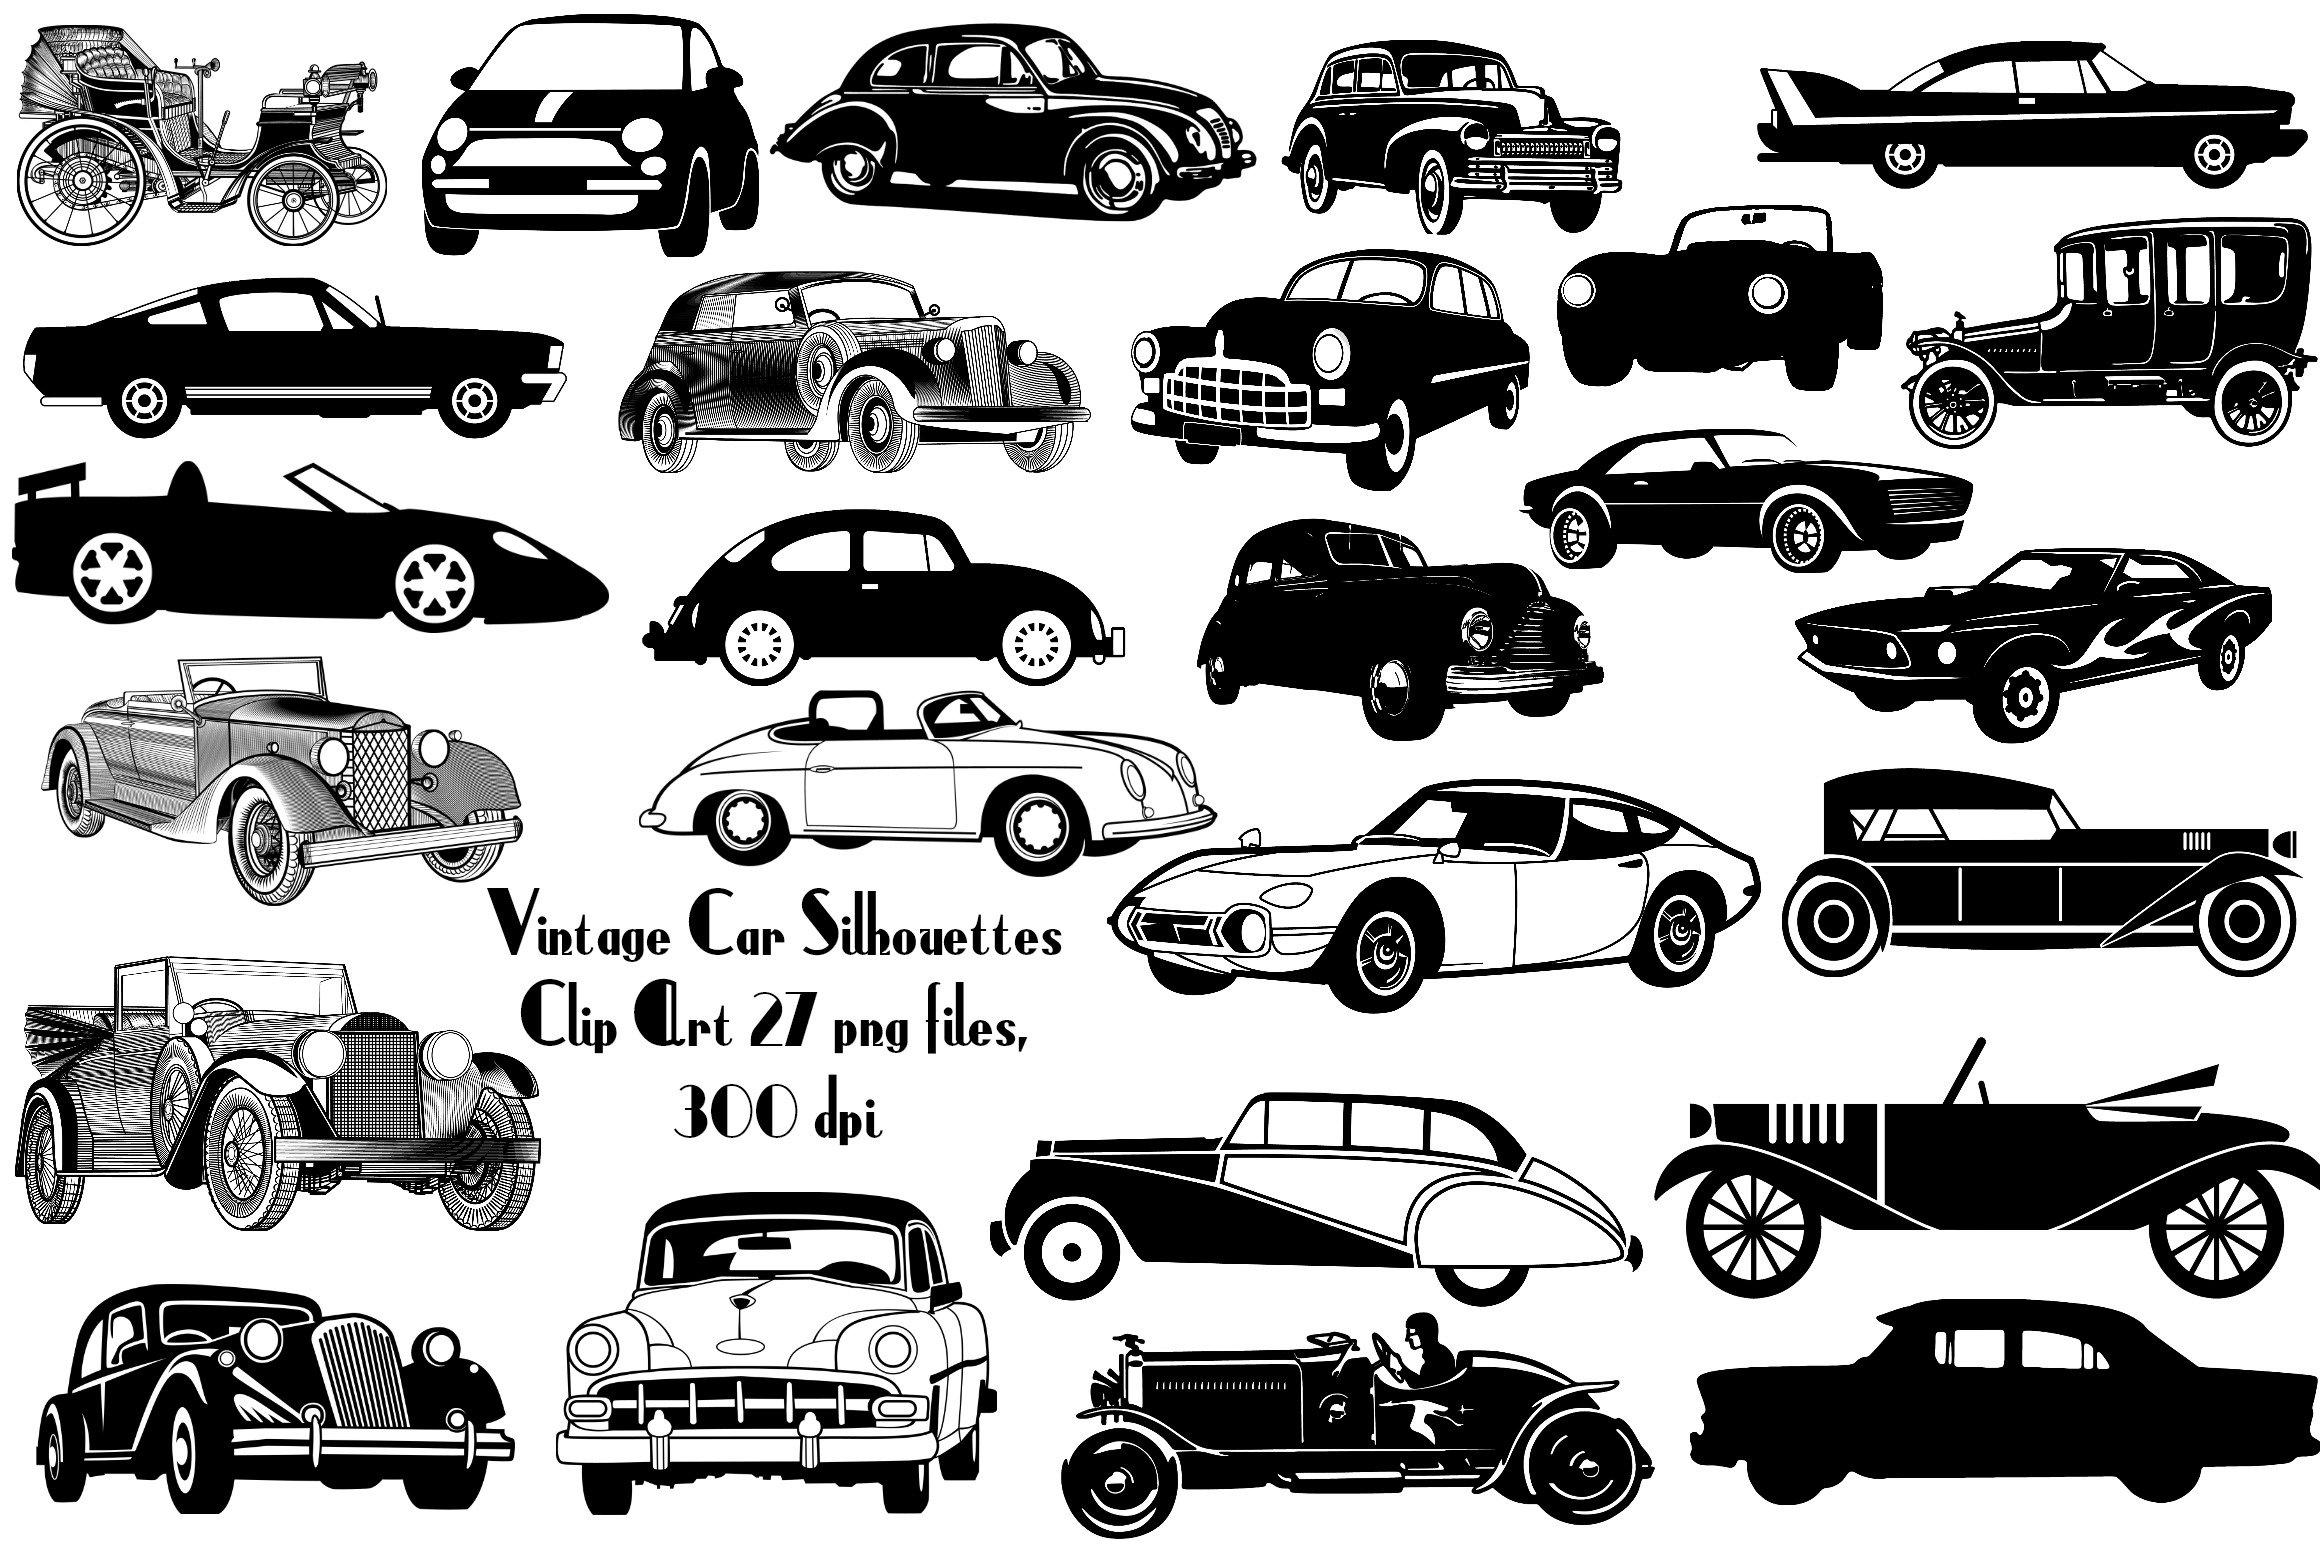 Vintage Car Silhouettes AI EPS PNG ~ Illustrations ~ Creative Market